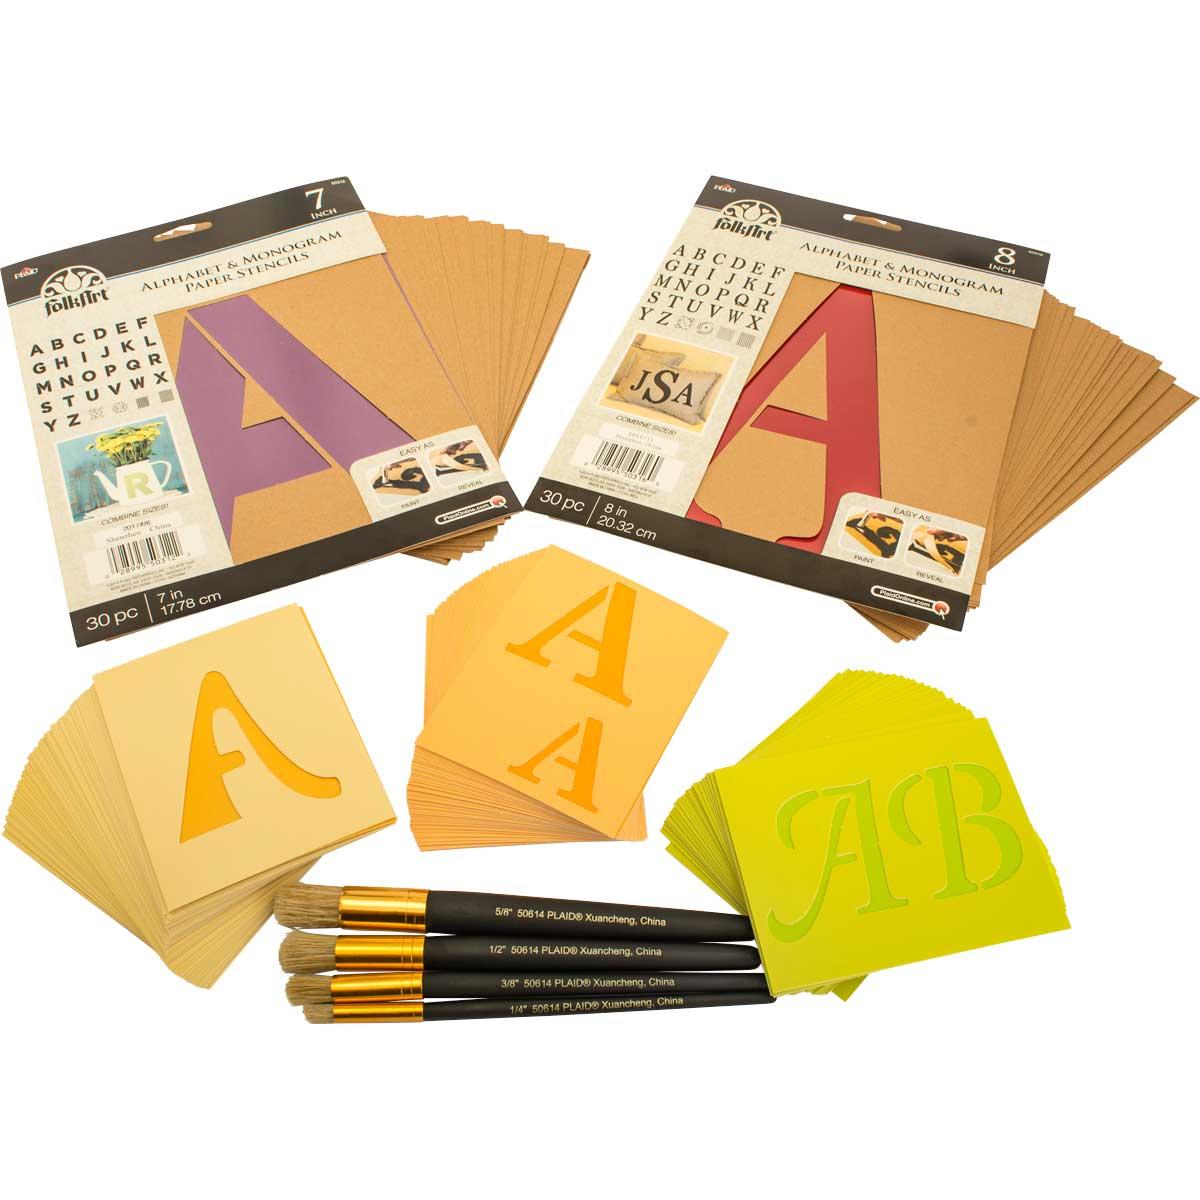 FolkArt ® Ultimate Paper Alphabet Stencil and Brush Kit - PROMOFAPAB